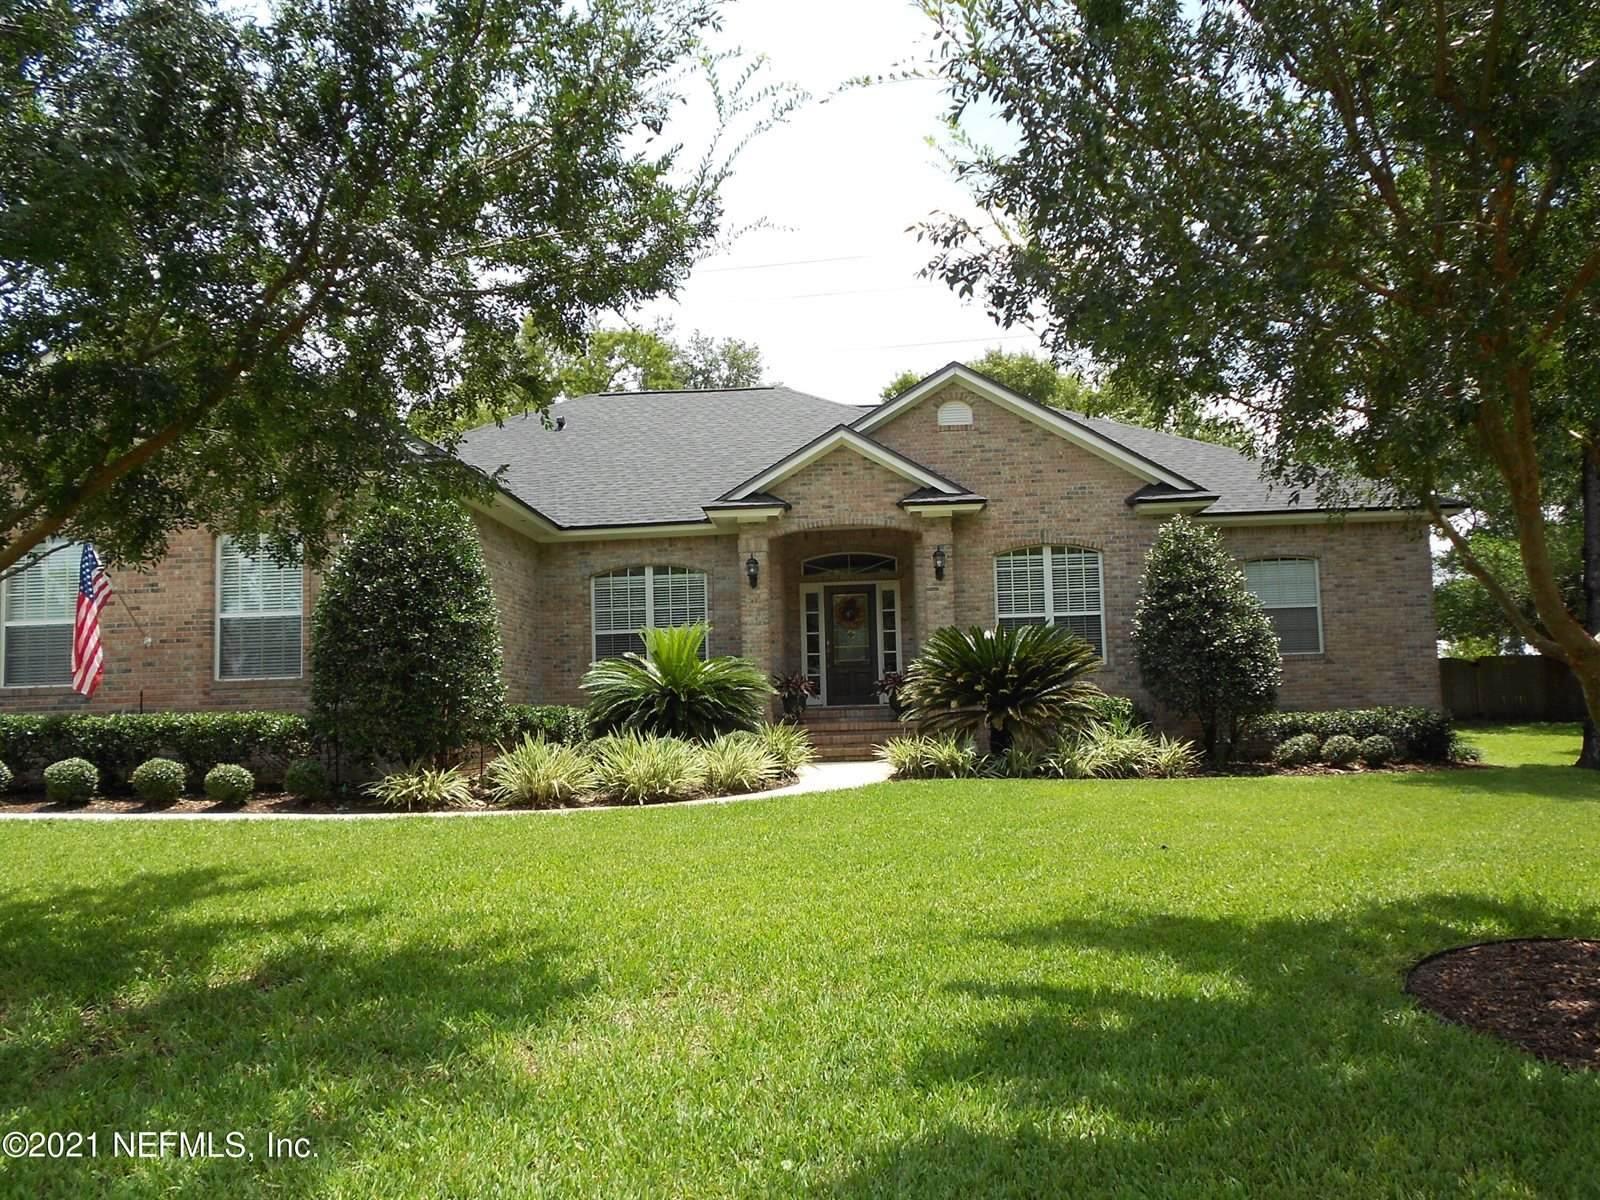 12820 Muirfield Blvd South, Jacksonville, FL 32225